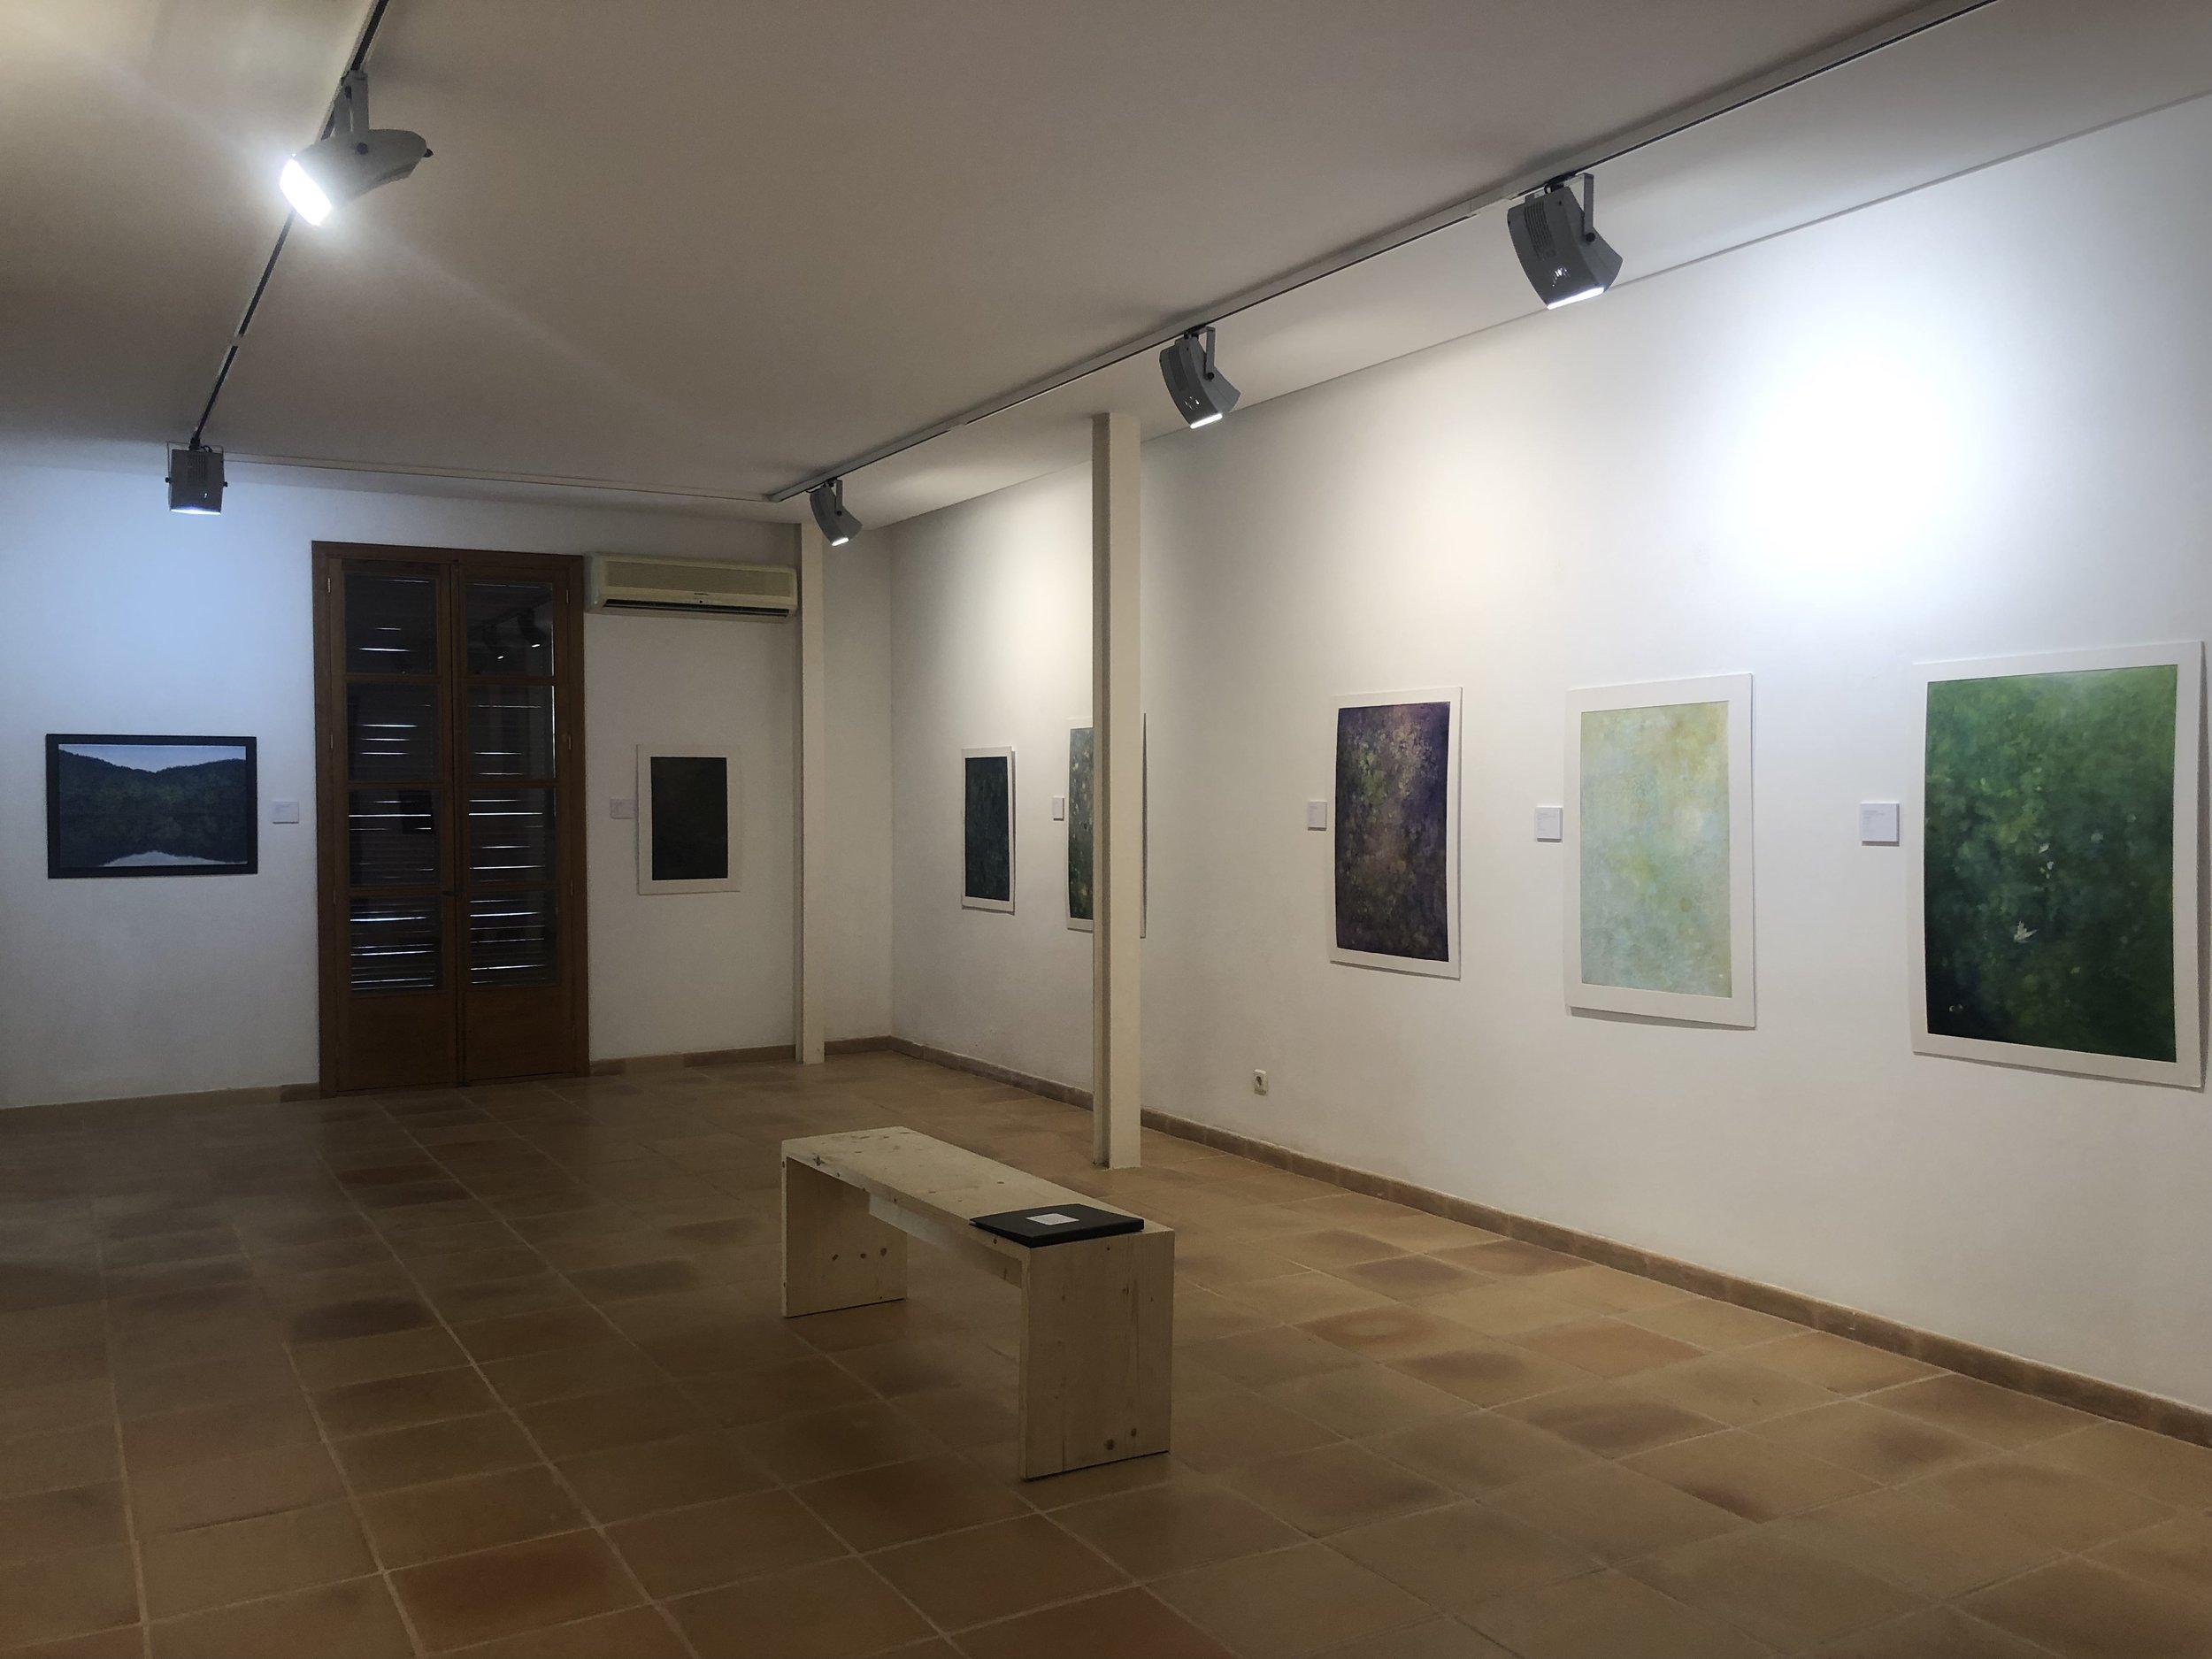 Far wall: Kumiko Okamoto-Paulisch Right wall: Hisako Kobayashi